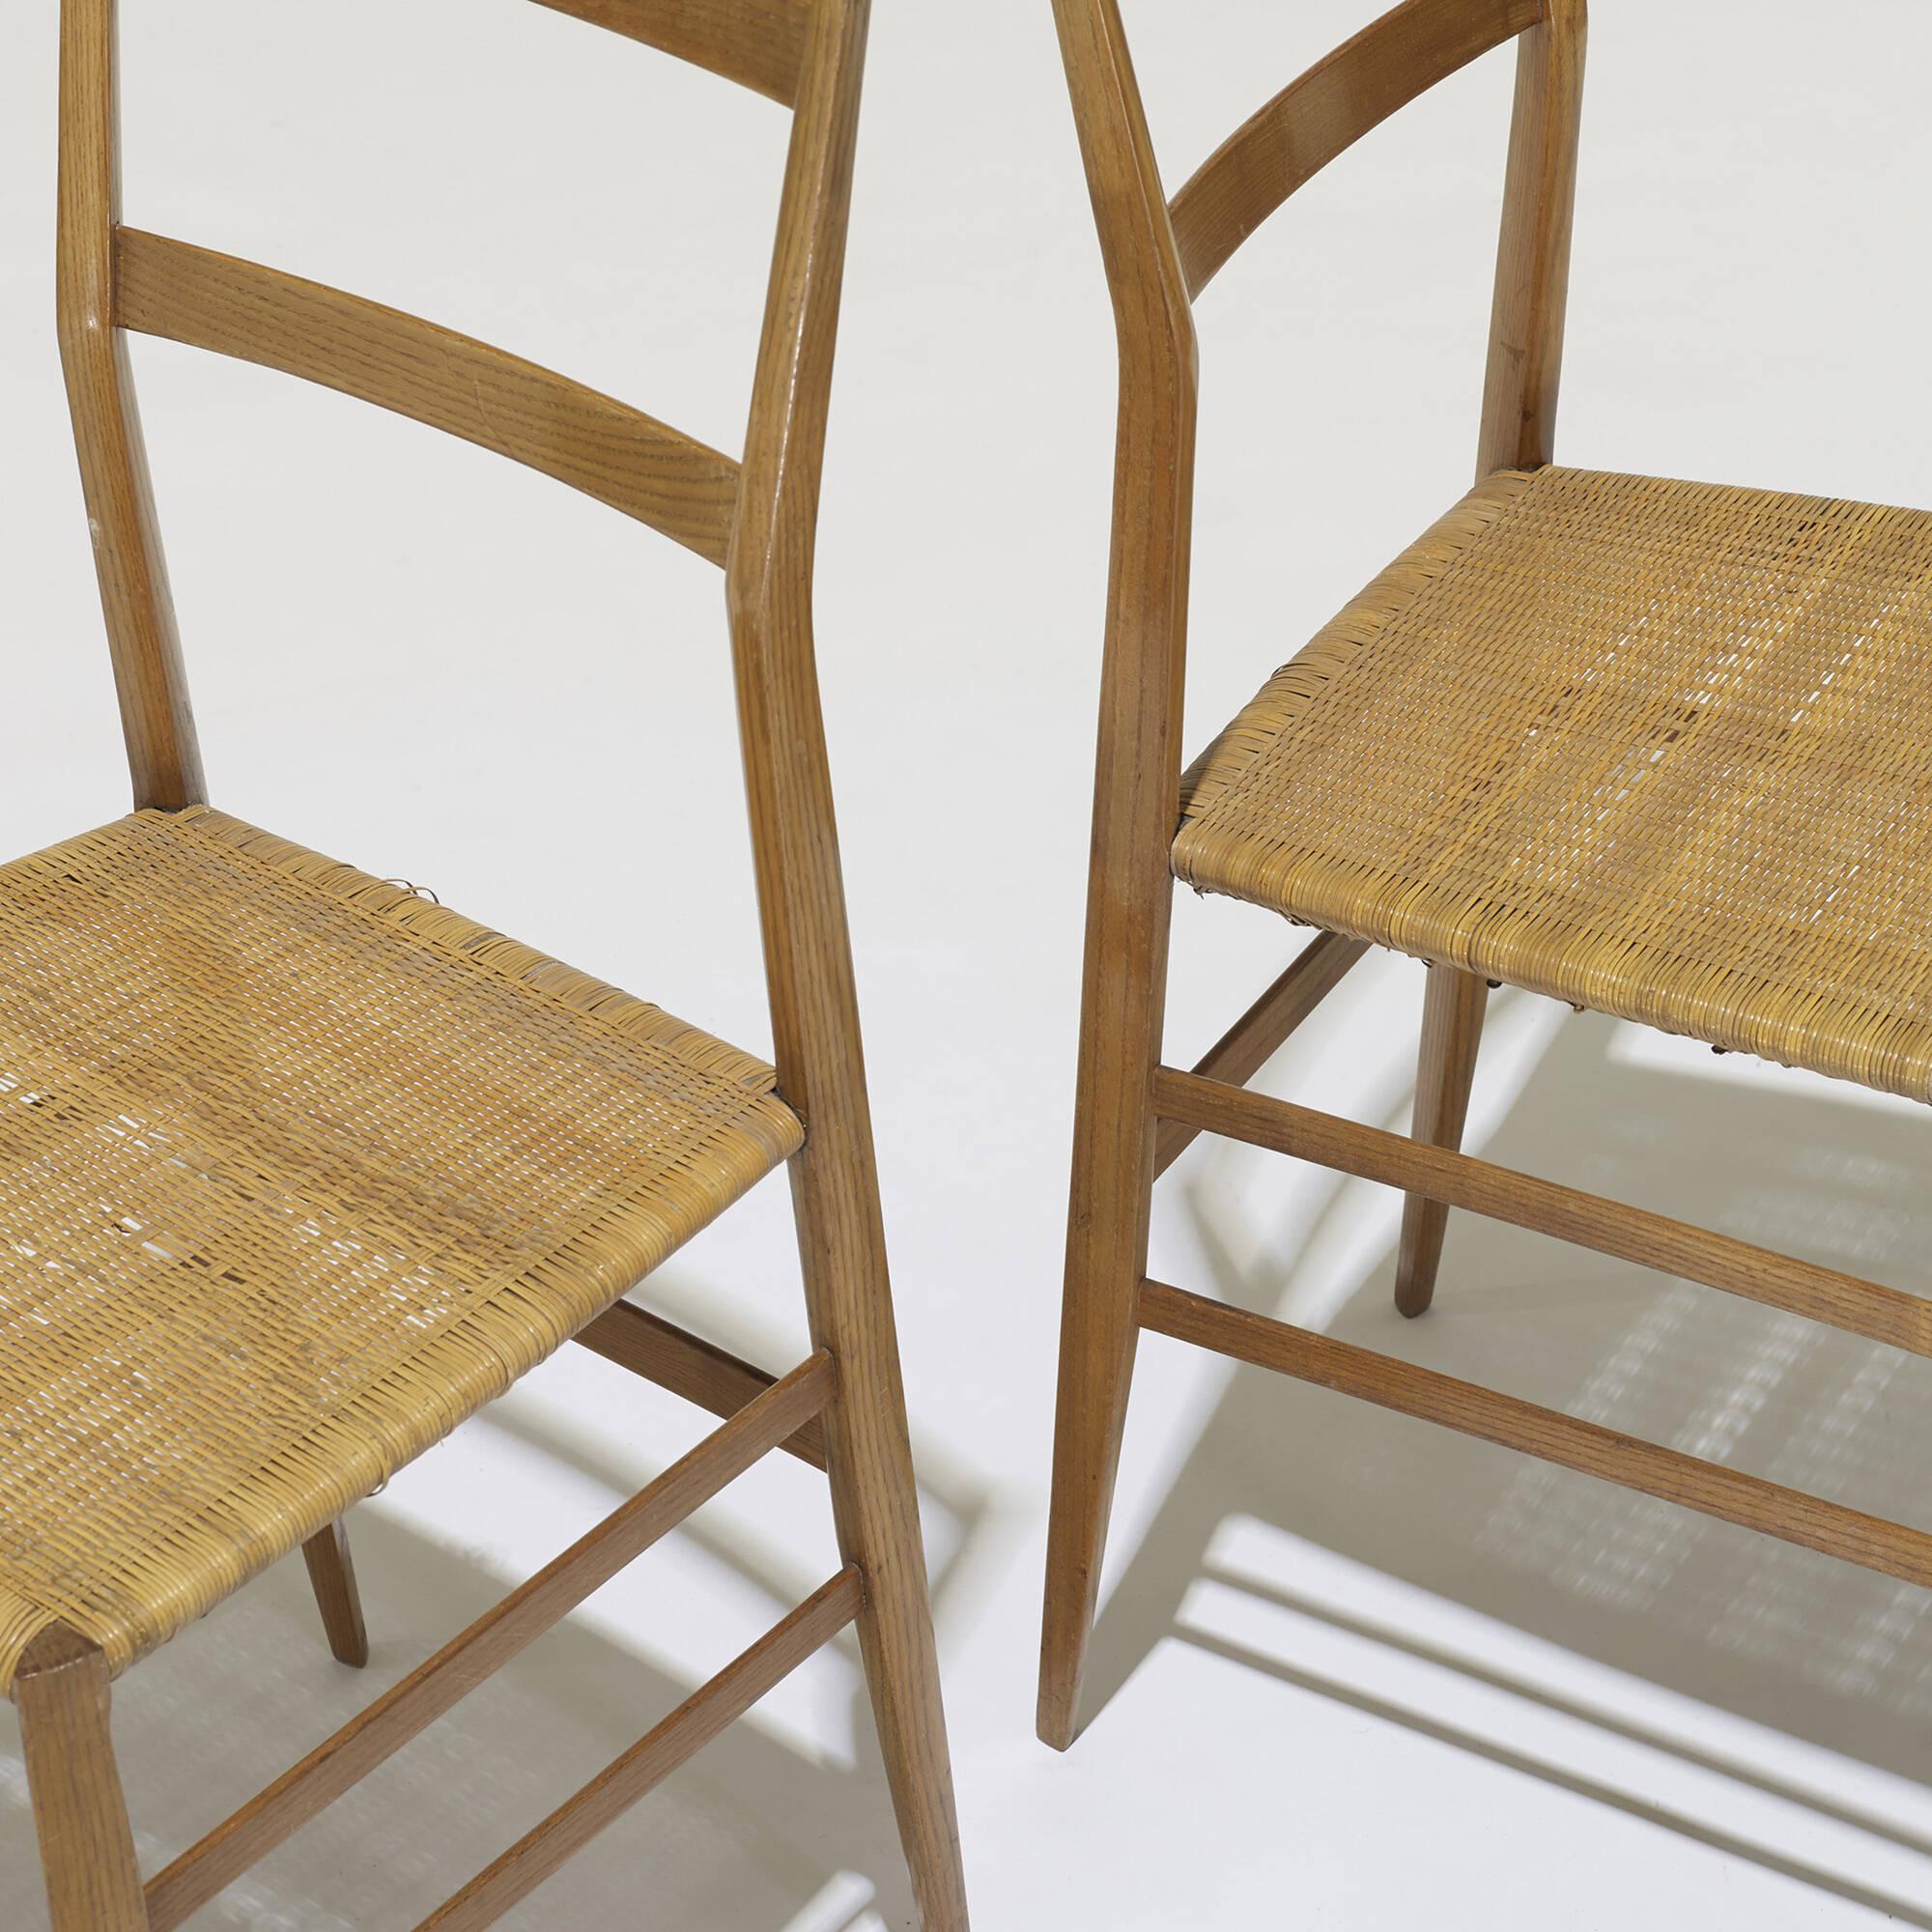 341 Gio Ponti Superleggera chairs set of eight Modern Design